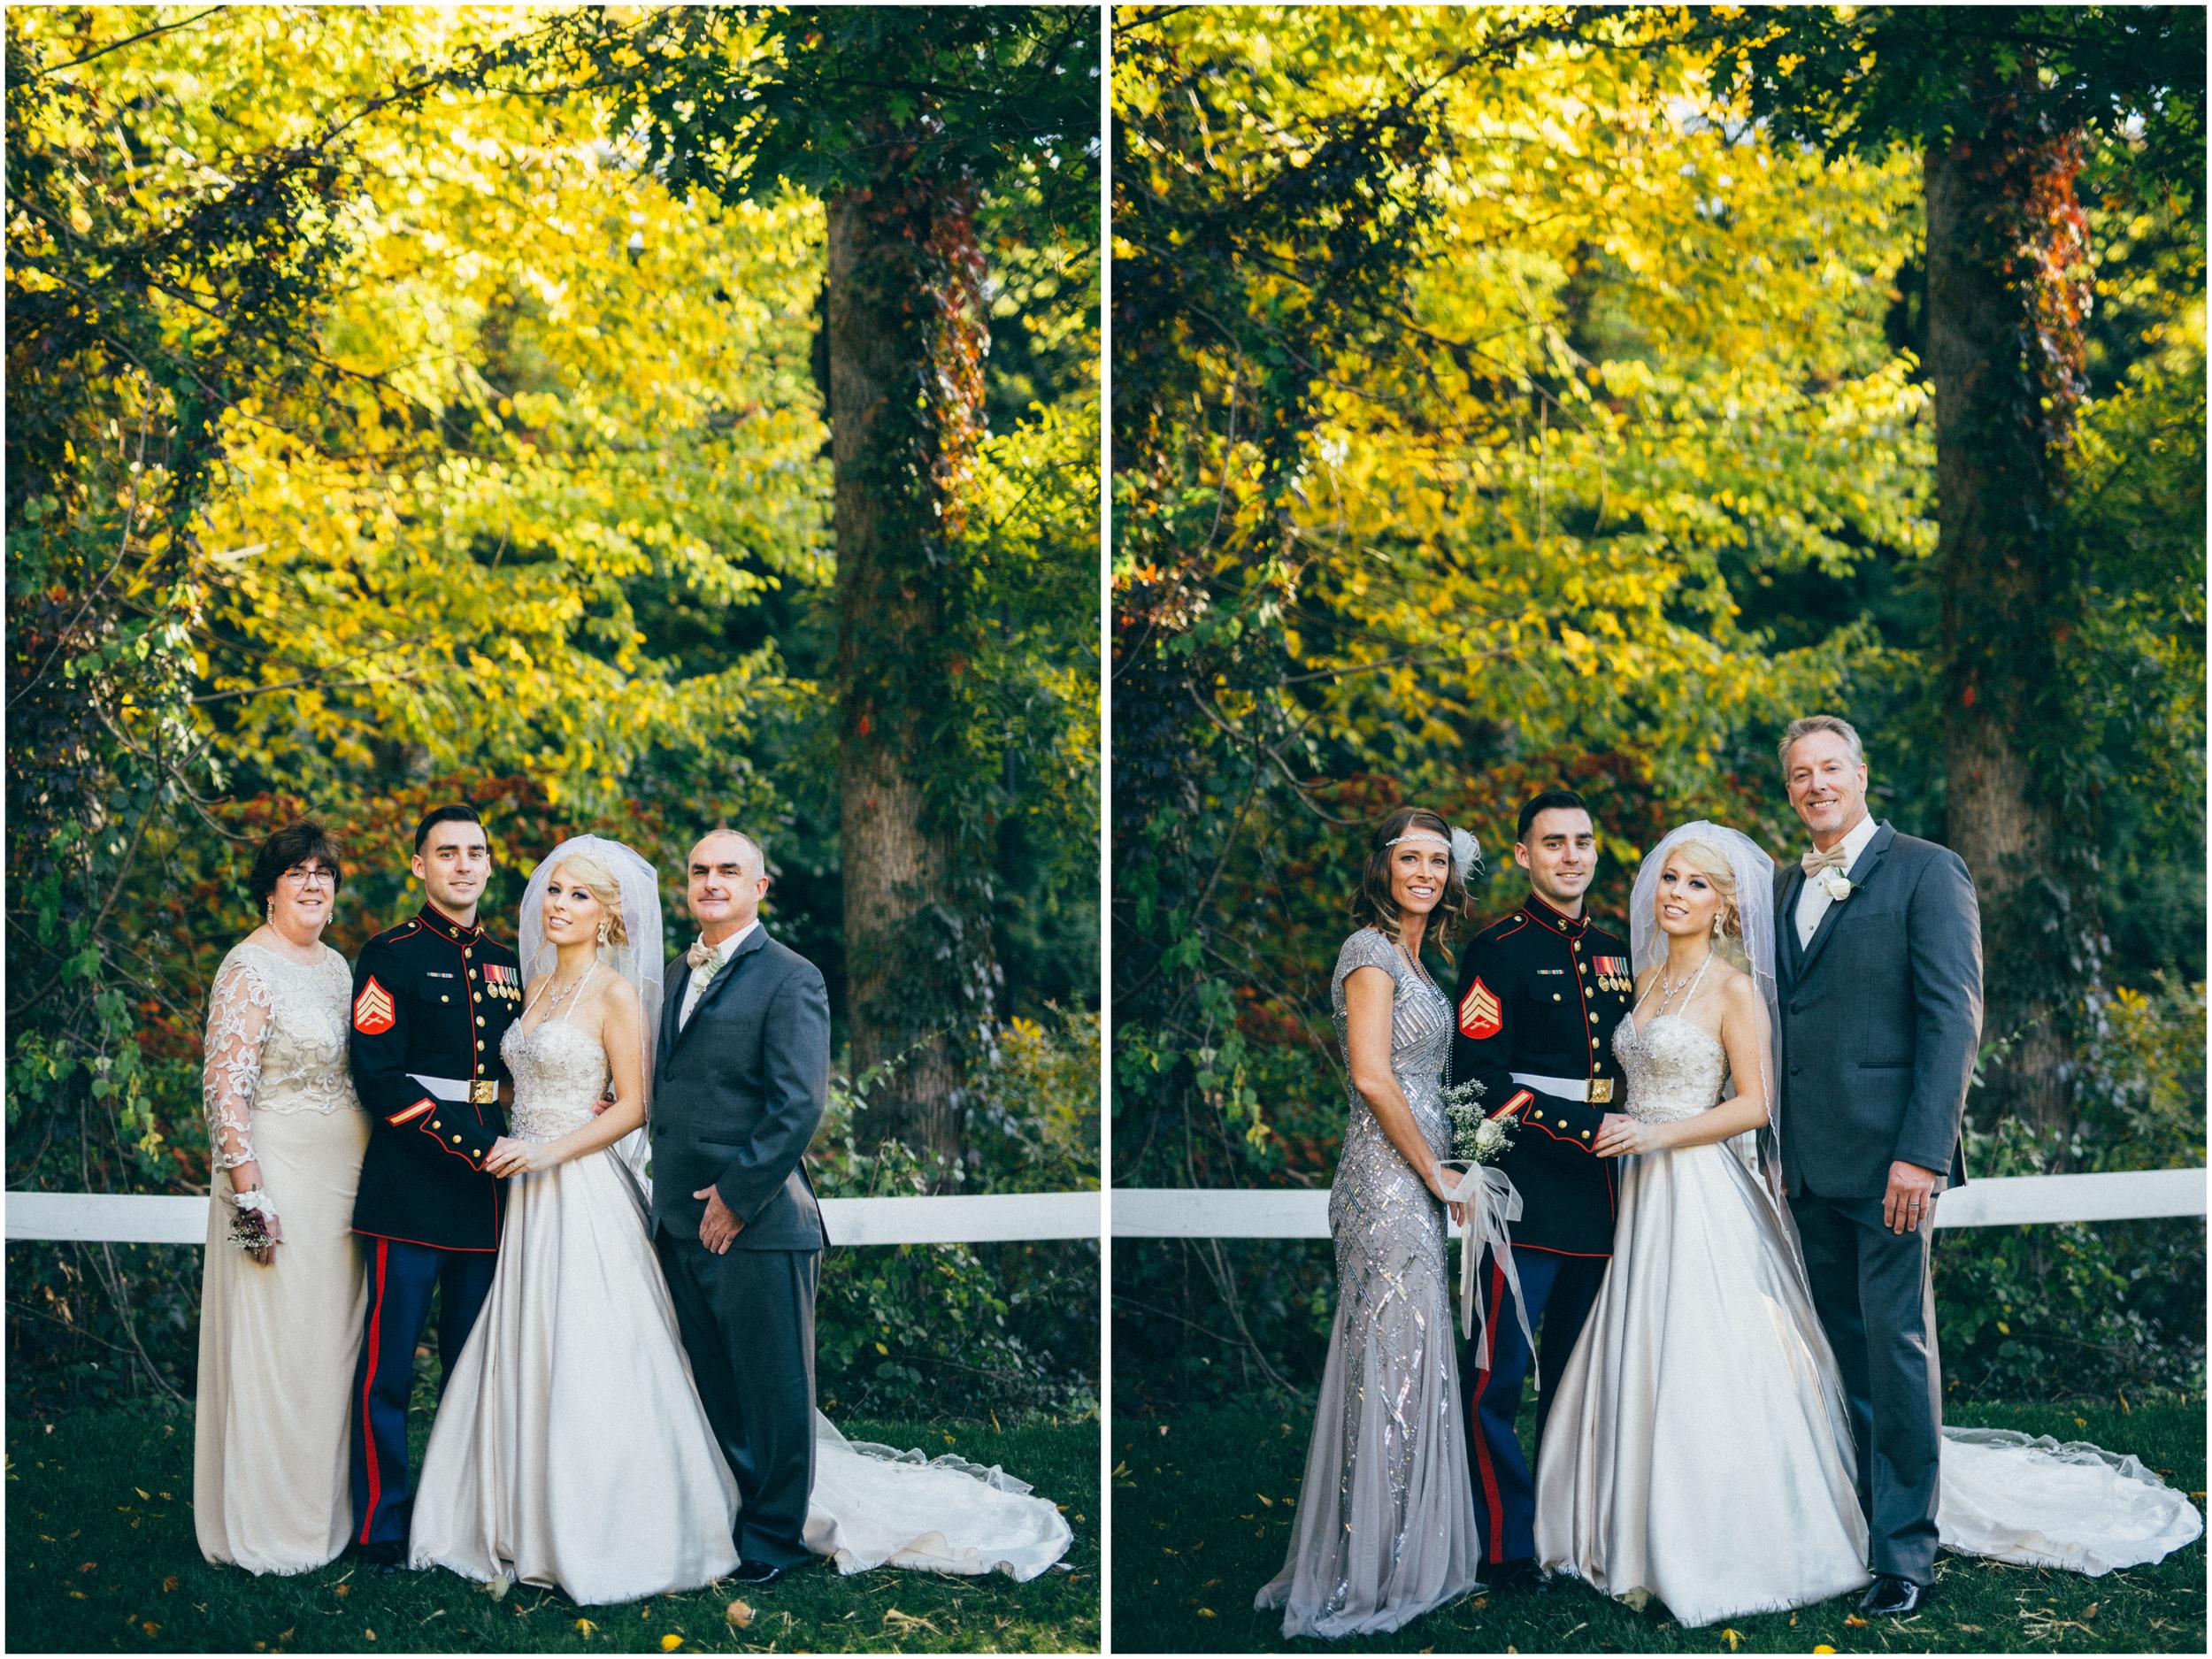 Luke_justine_CT_wedding9.jpg